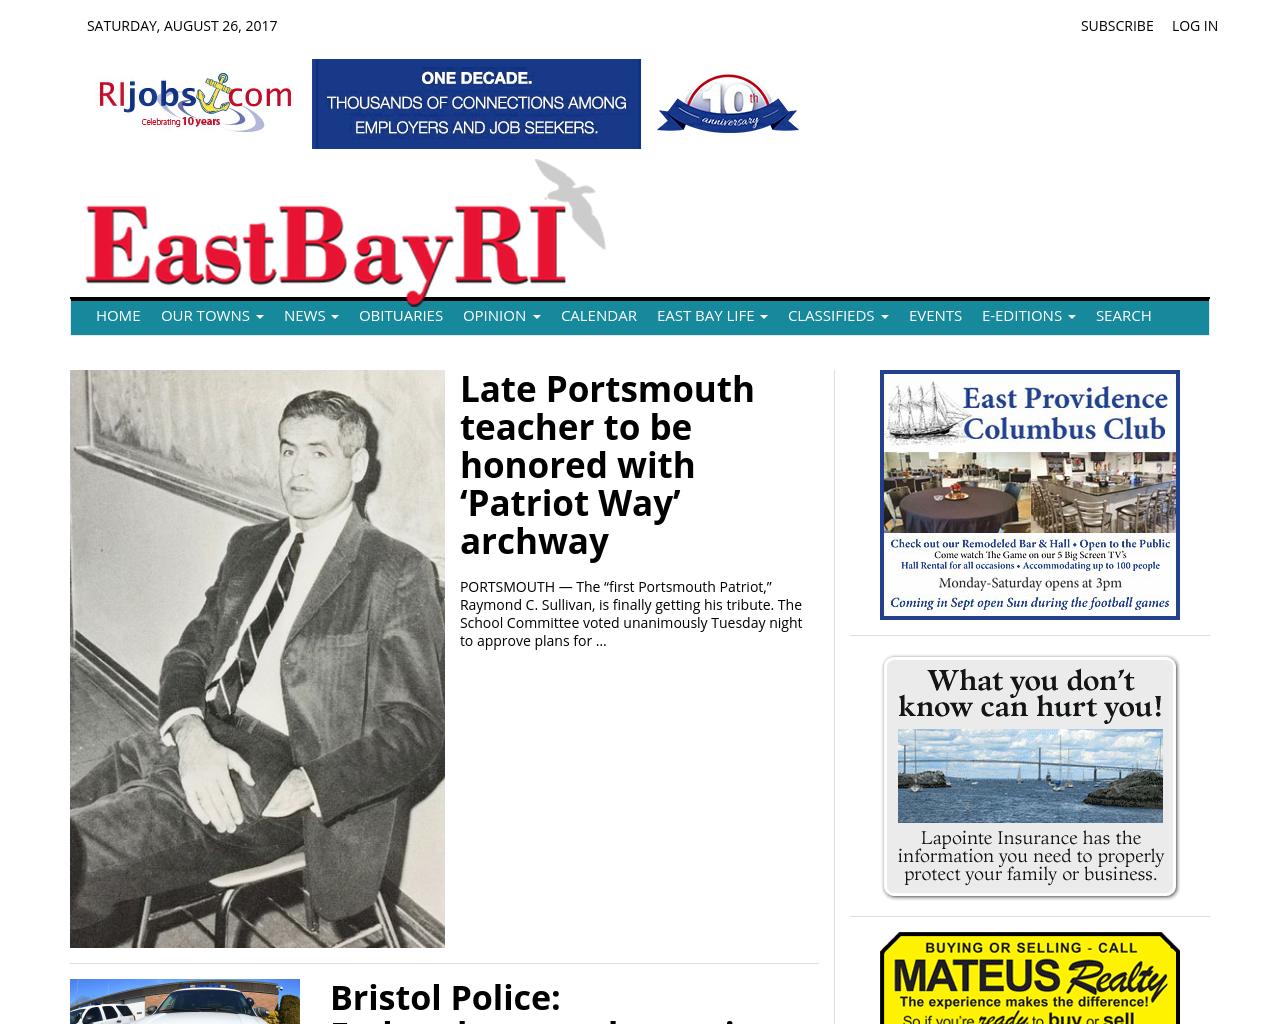 East-Bay-RI-Advertising-Reviews-Pricing